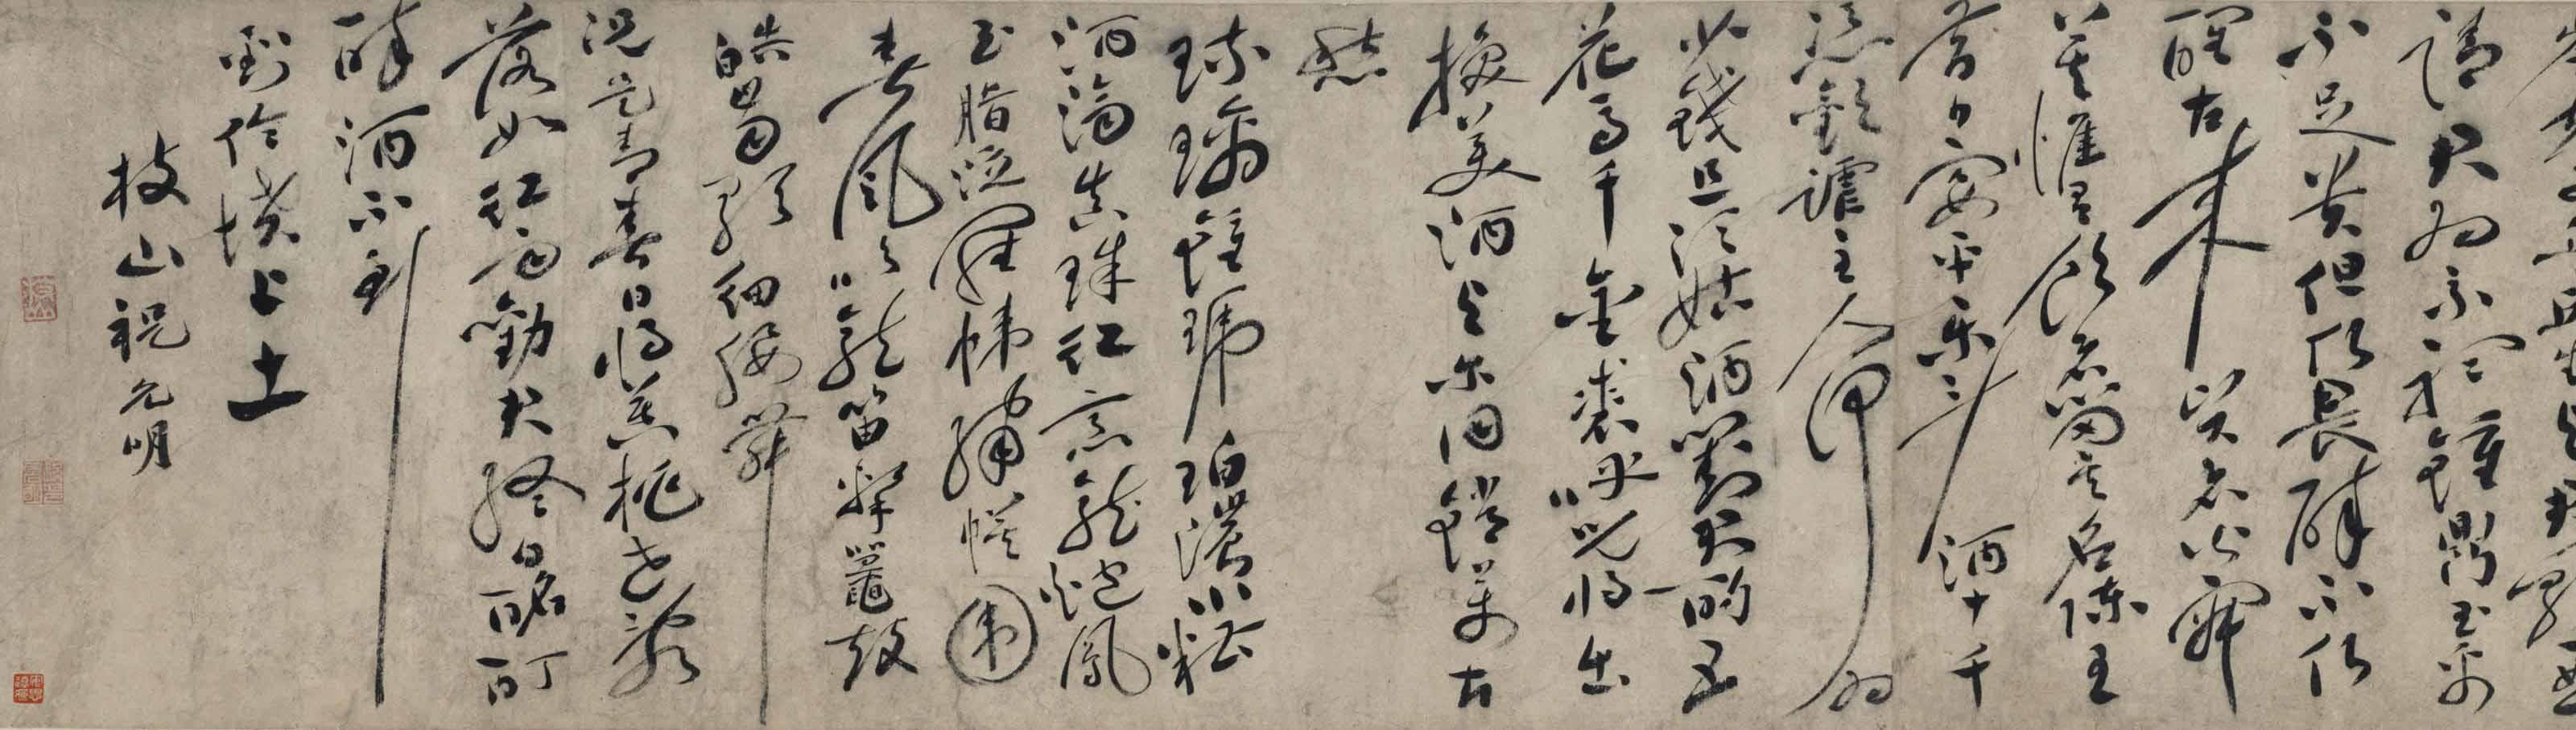 ZHU YUNMING (ATTRIBUTED TO, 14